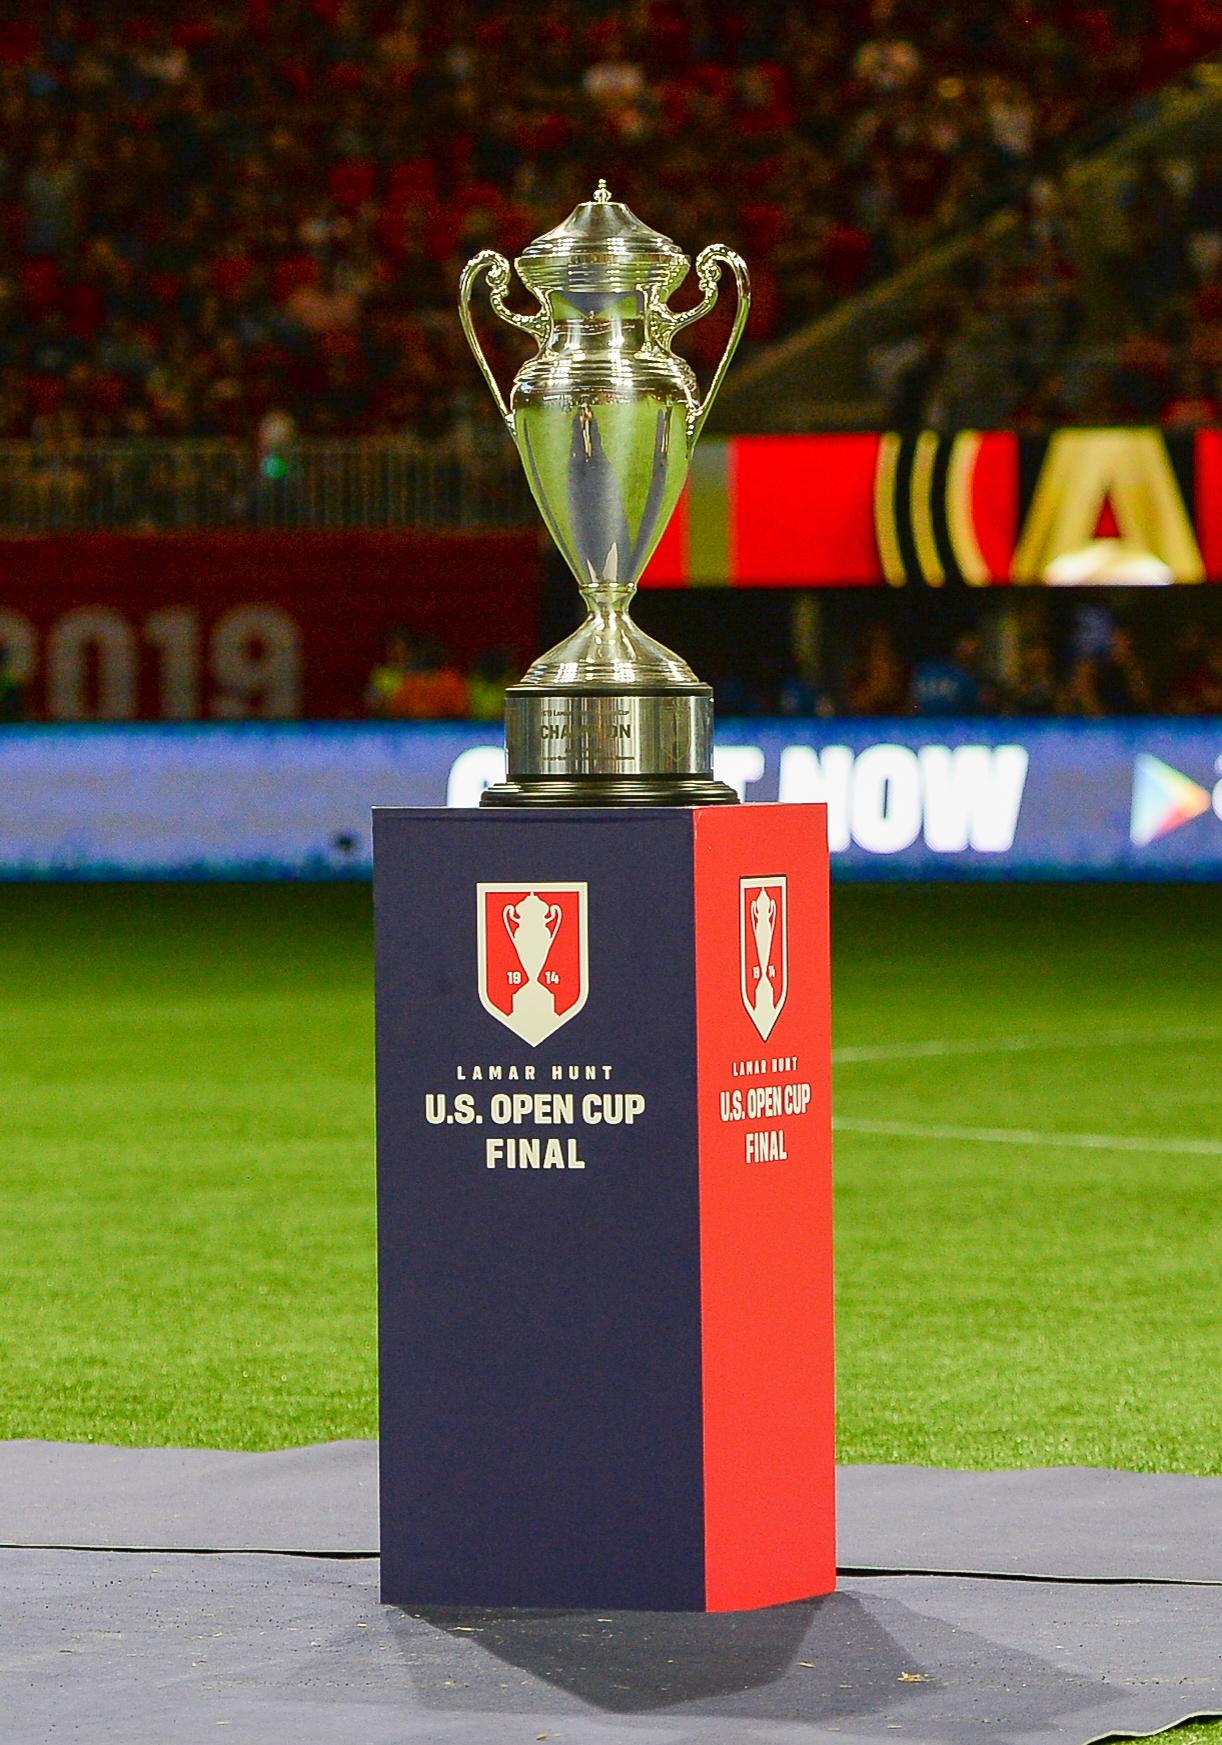 SOCCER: AUG 27 US Open Cup Final - Minnesota United FC at Atlanta United FC